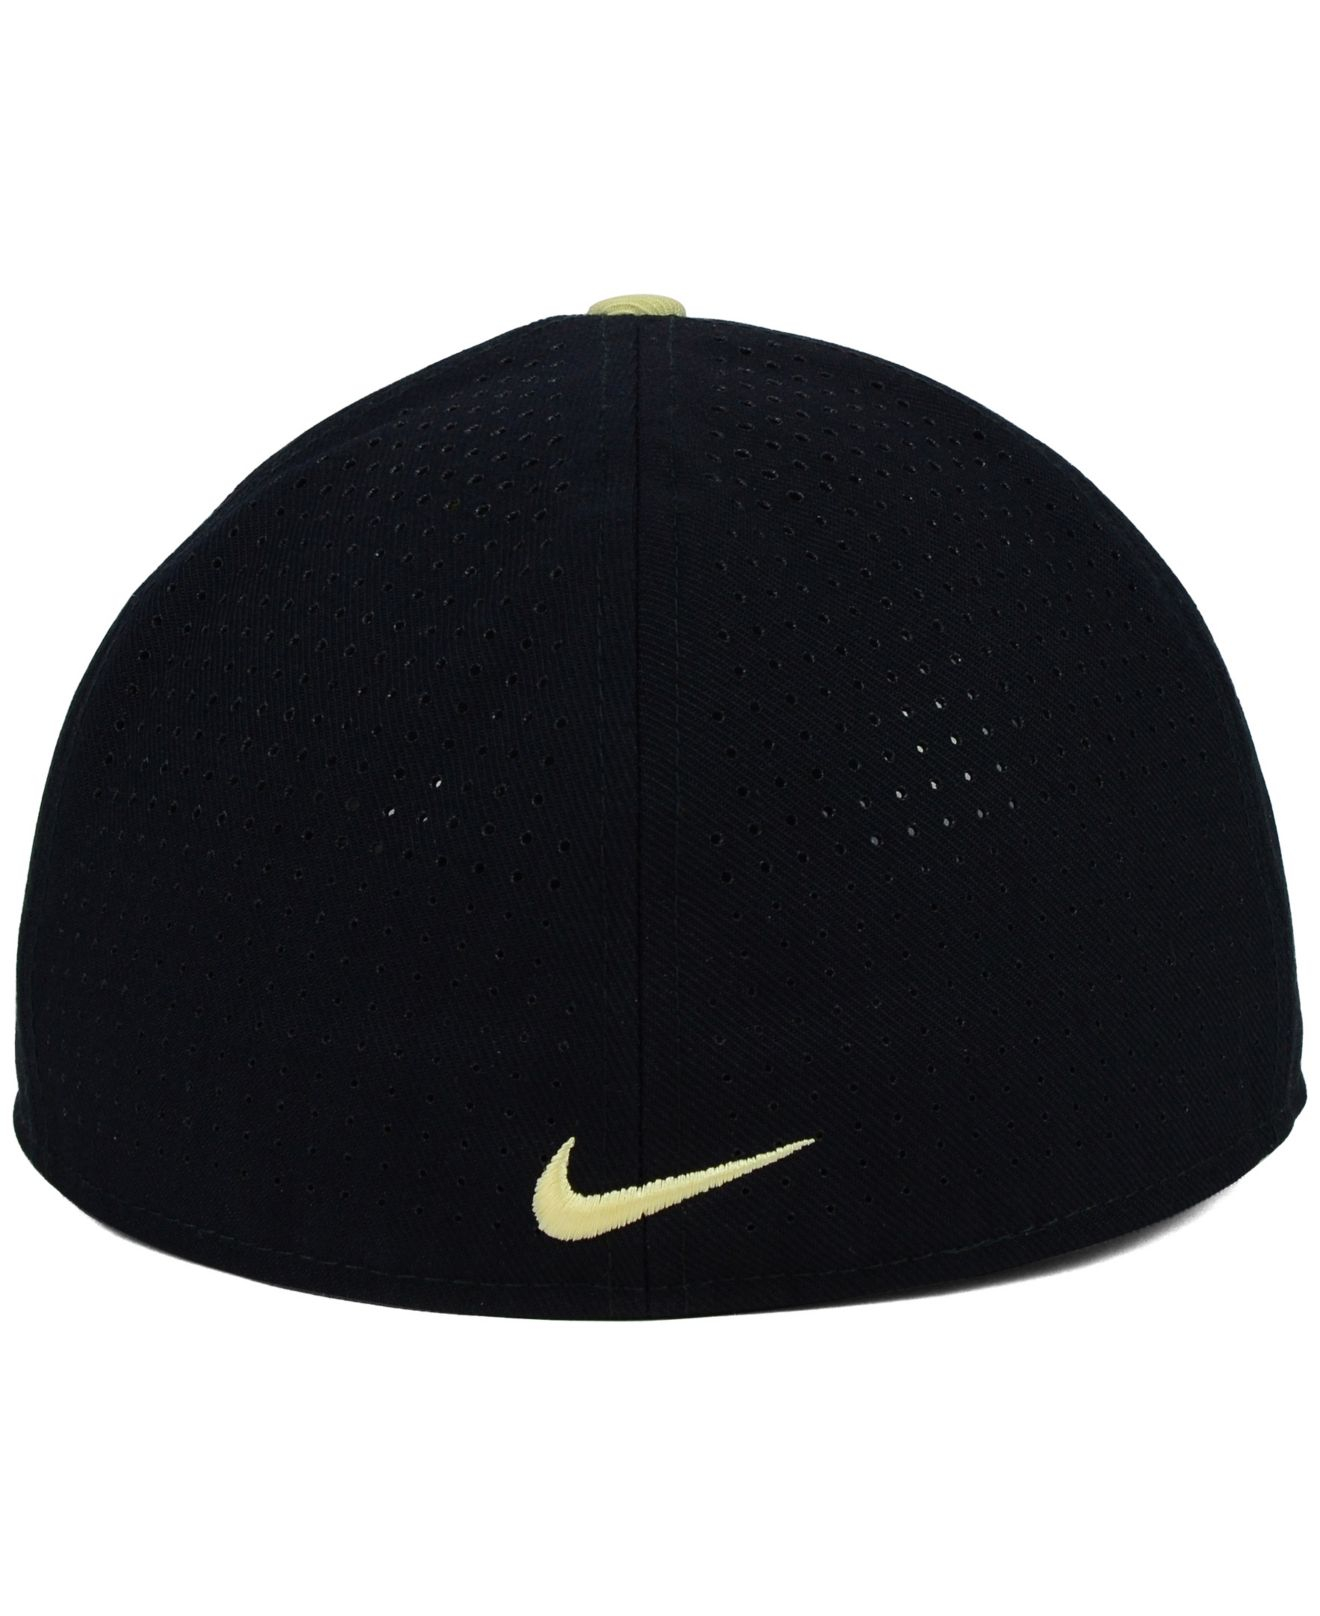 ab6f8caa3 discount code for vanderbilt nike hat fd1fa 4f6e2